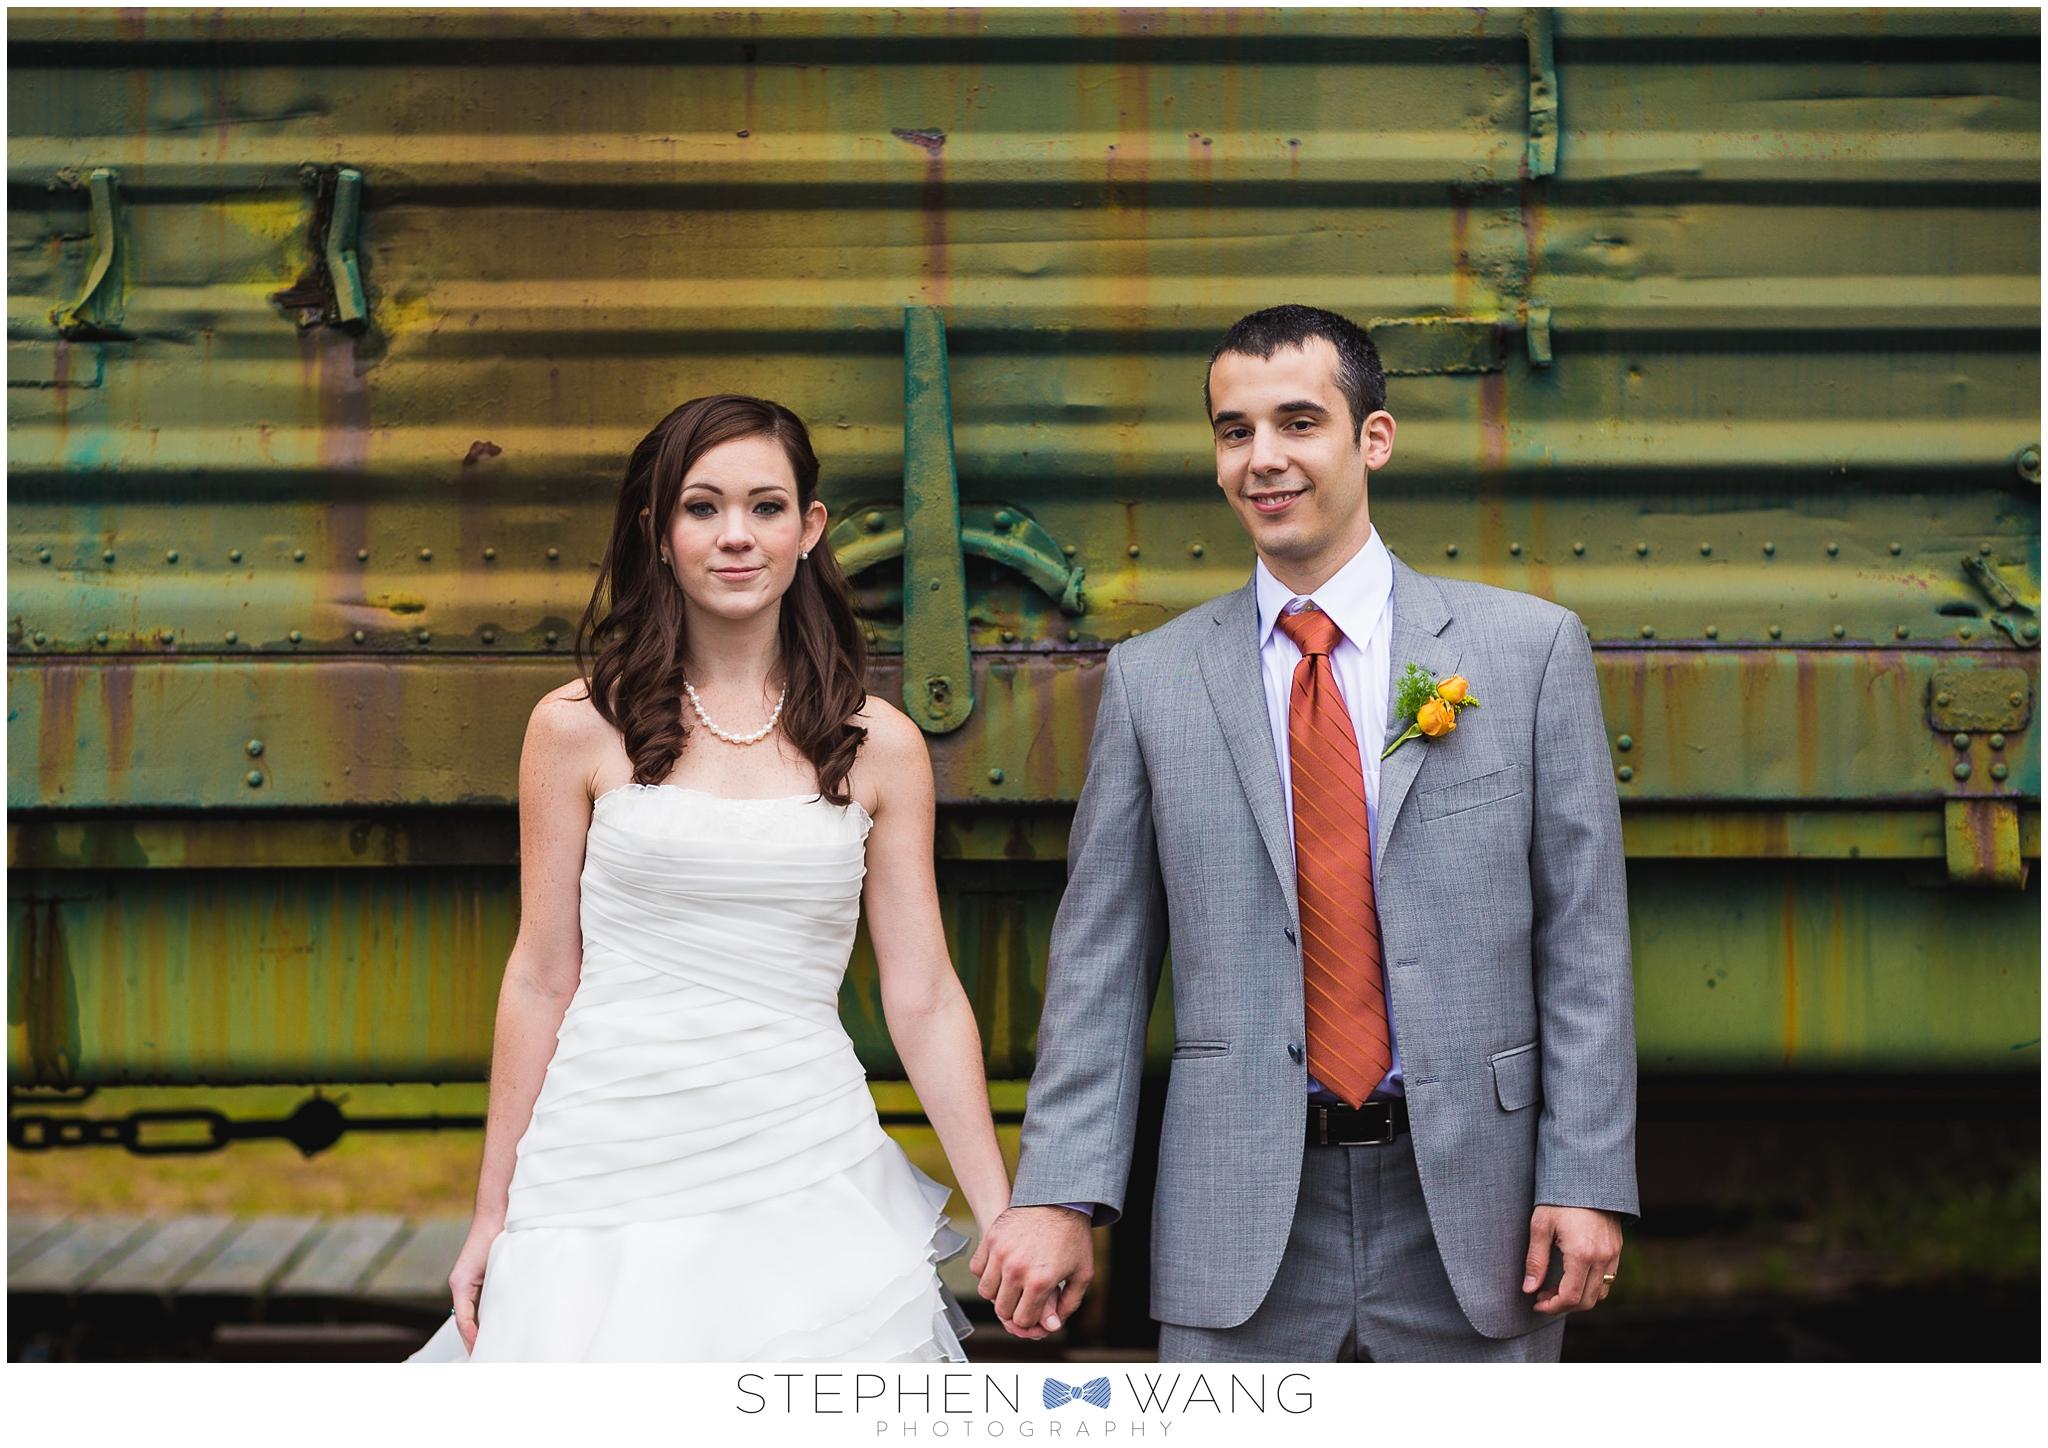 Stephen Wang Photography wedding connecticut deep river lace factory wedding photography connecticut photographer-01-22_0017.jpg